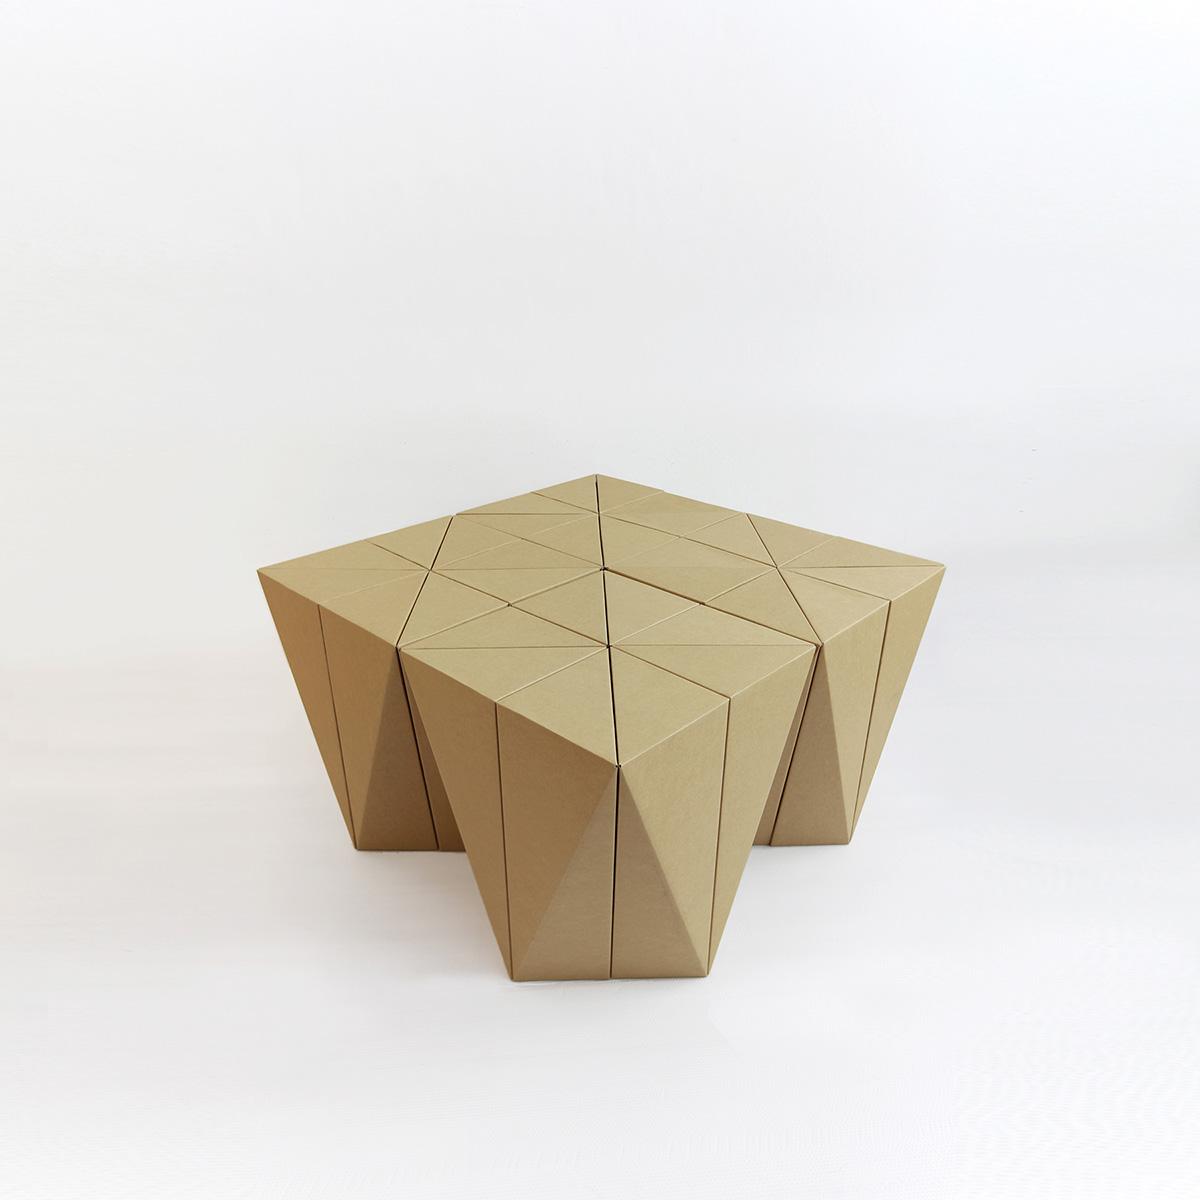 03-spiral-stool-misosoupdesign